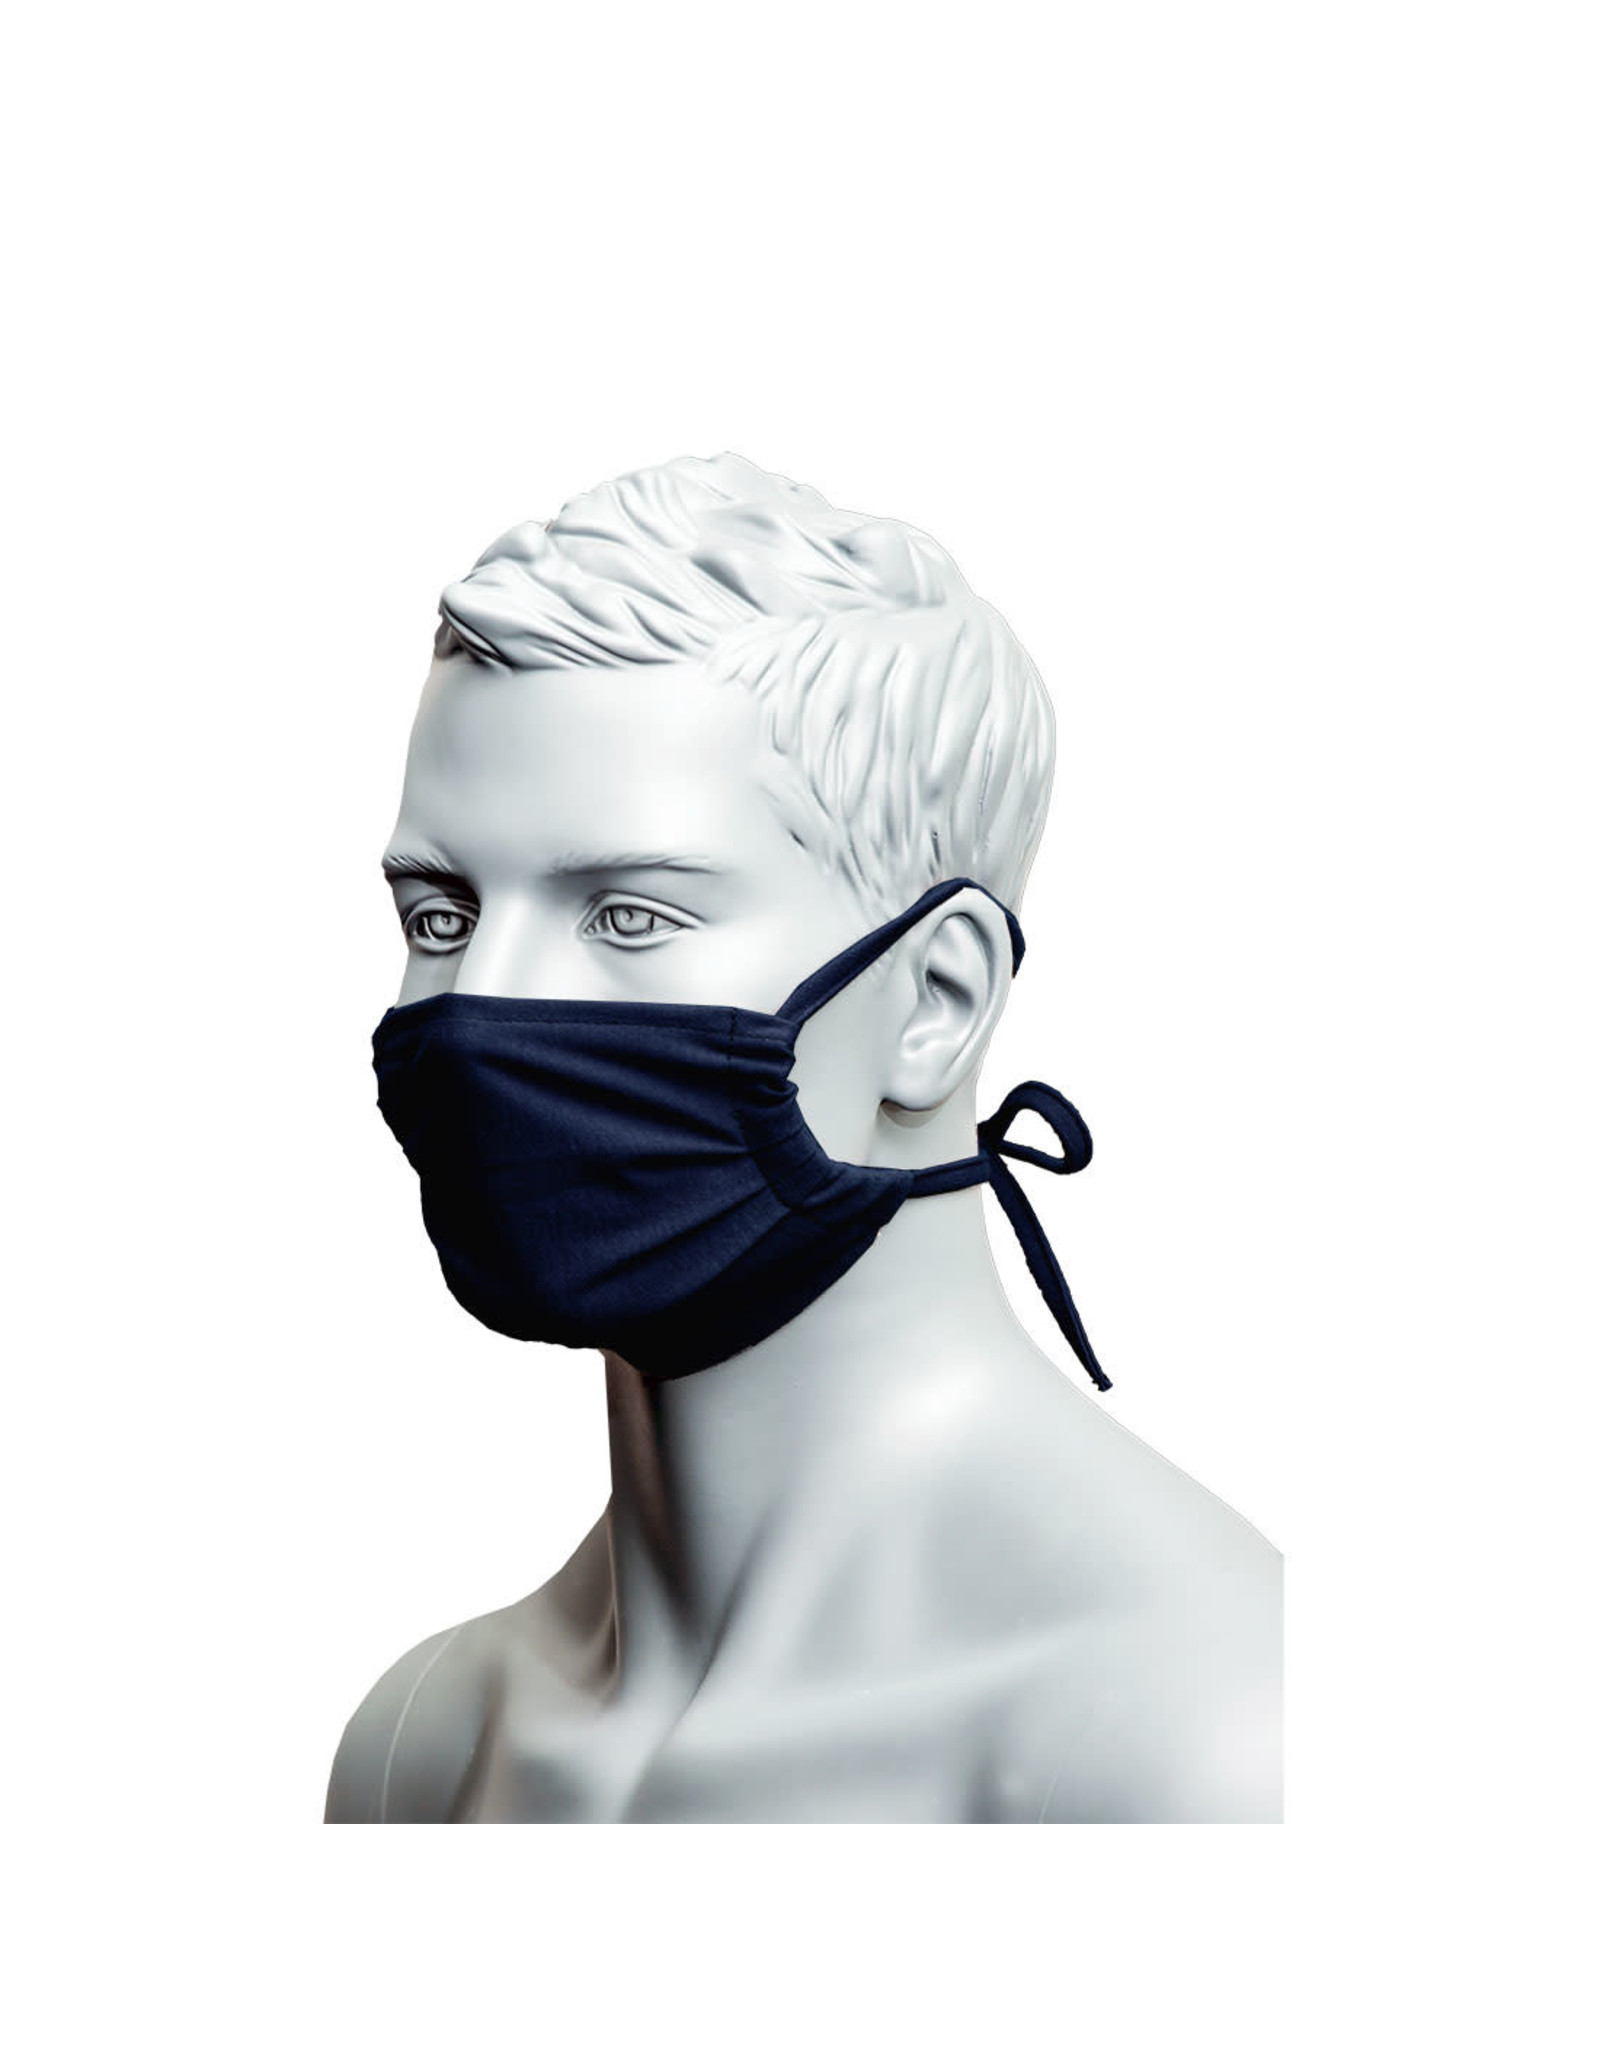 Portwest FR40 - FR Mask 25 per Box